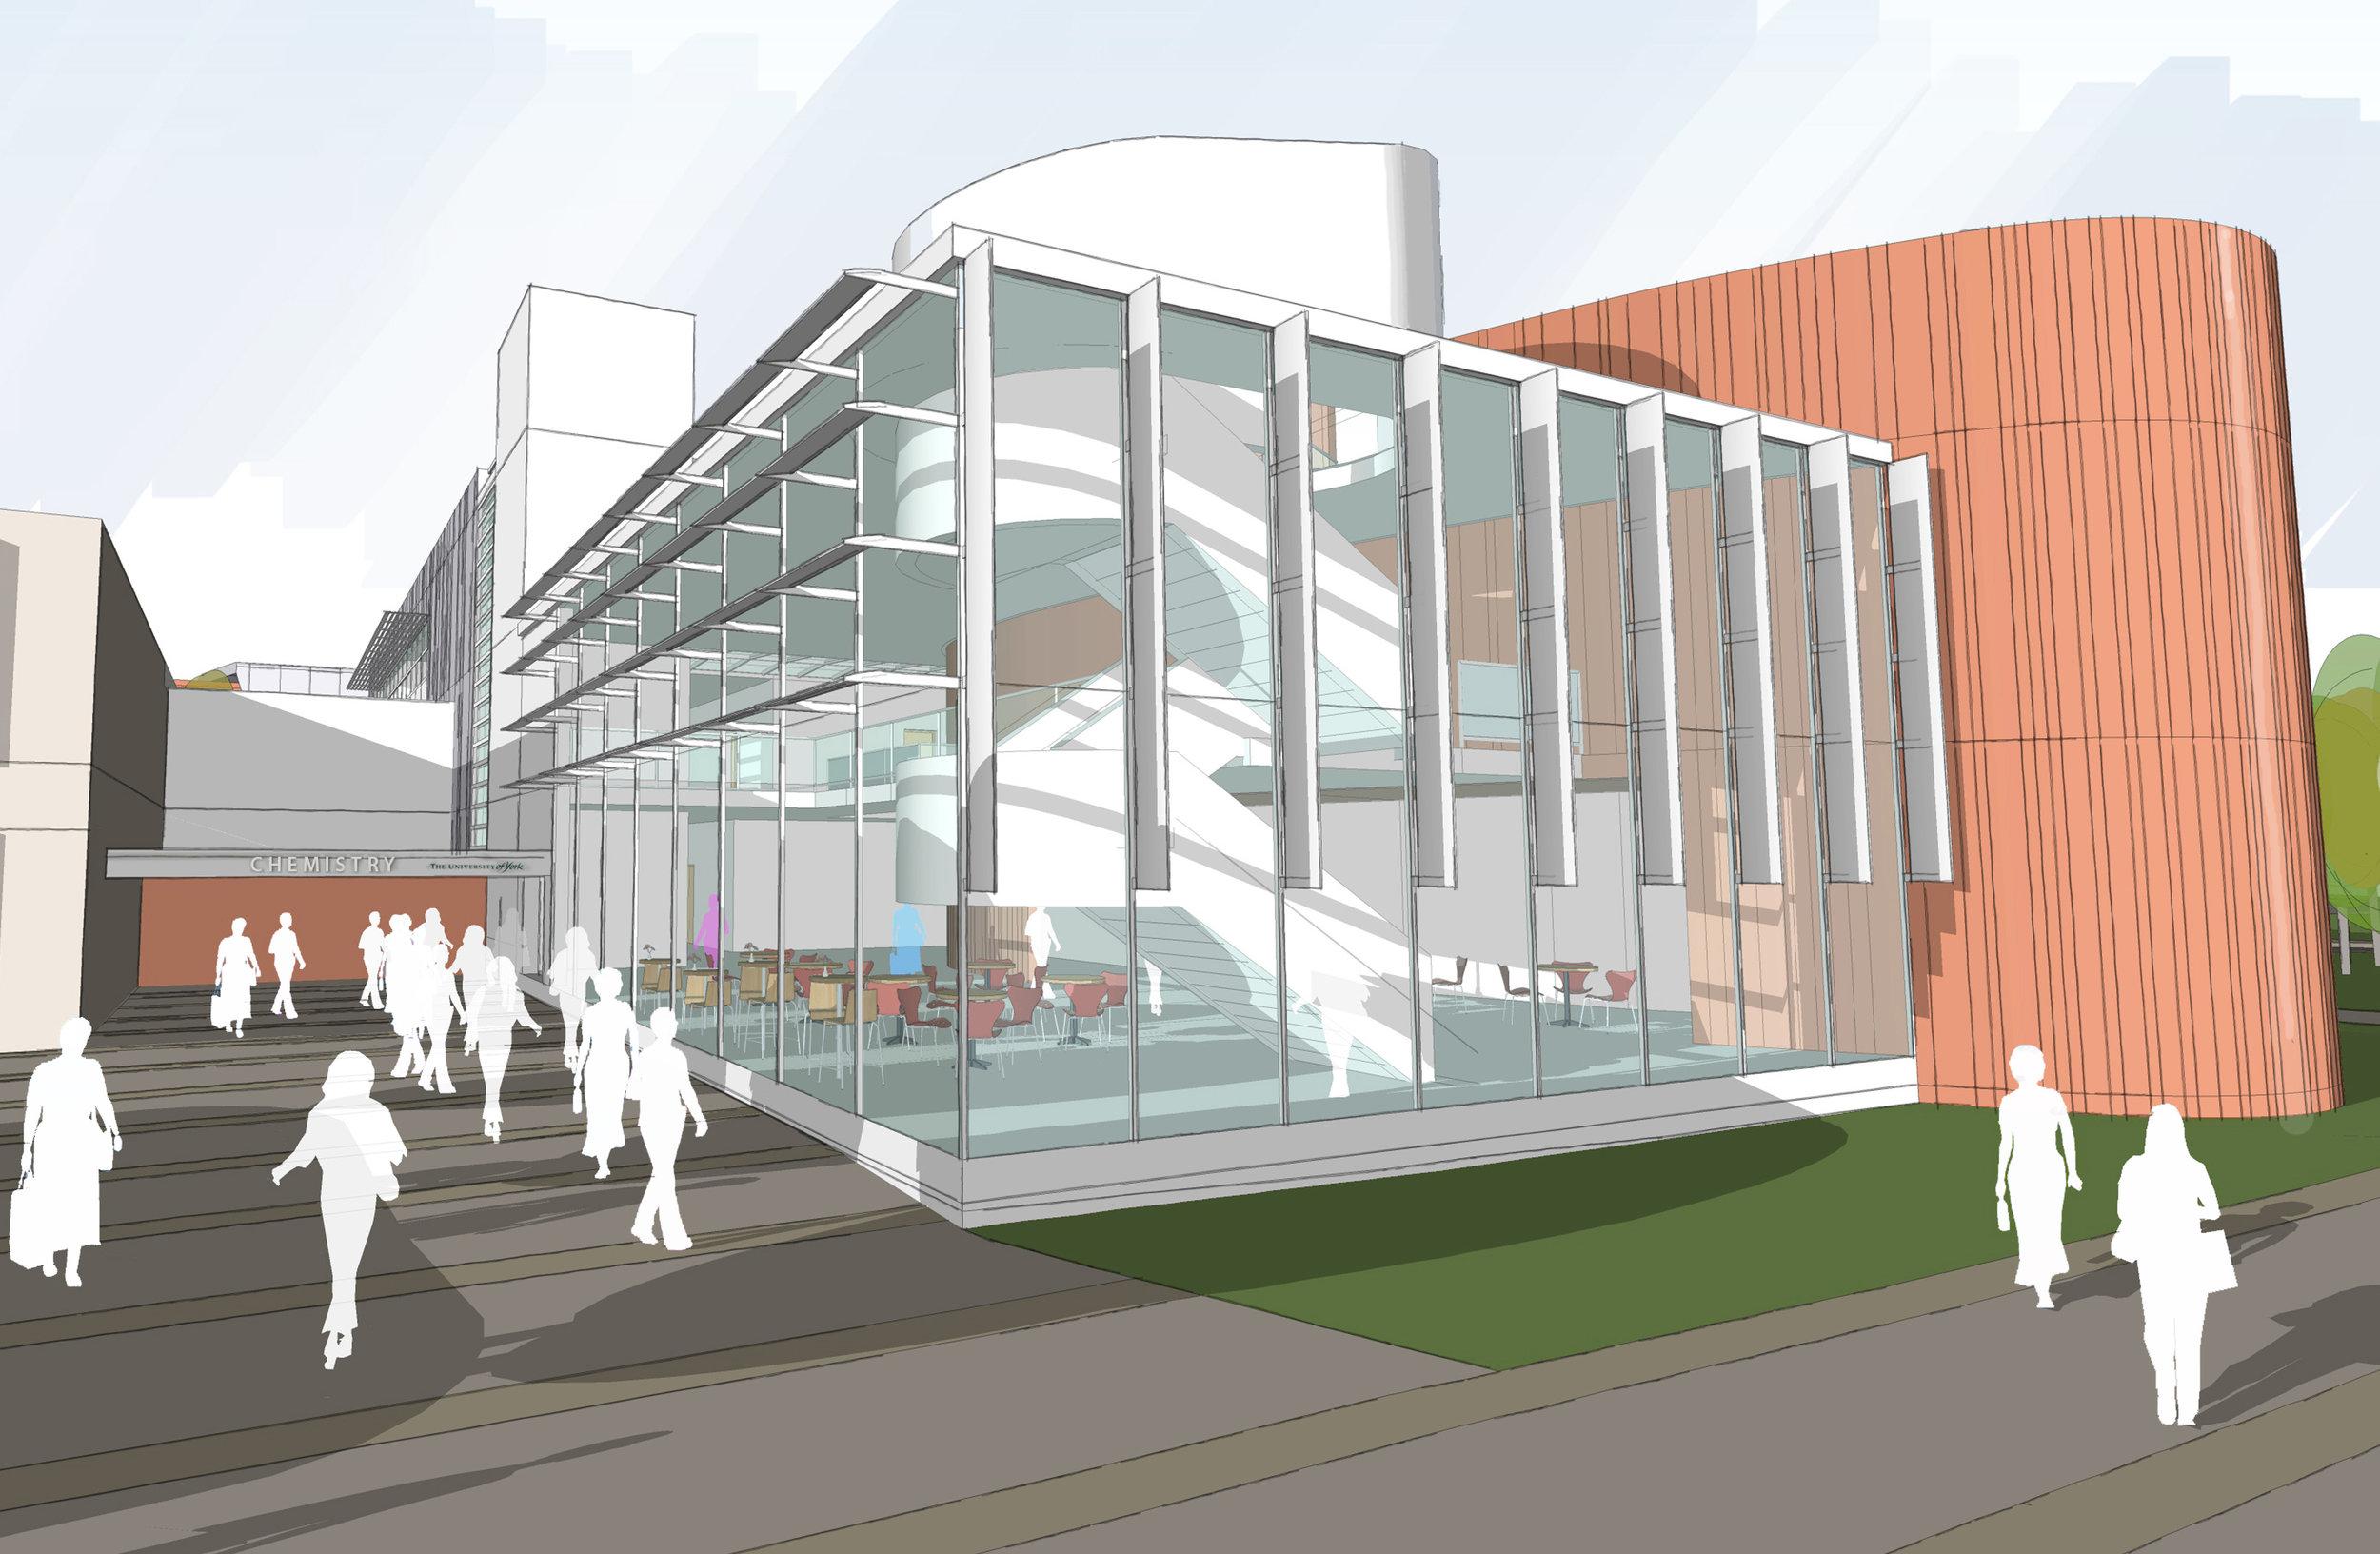 Stephen-Hill-Architects-Chemistry-Building-York-03